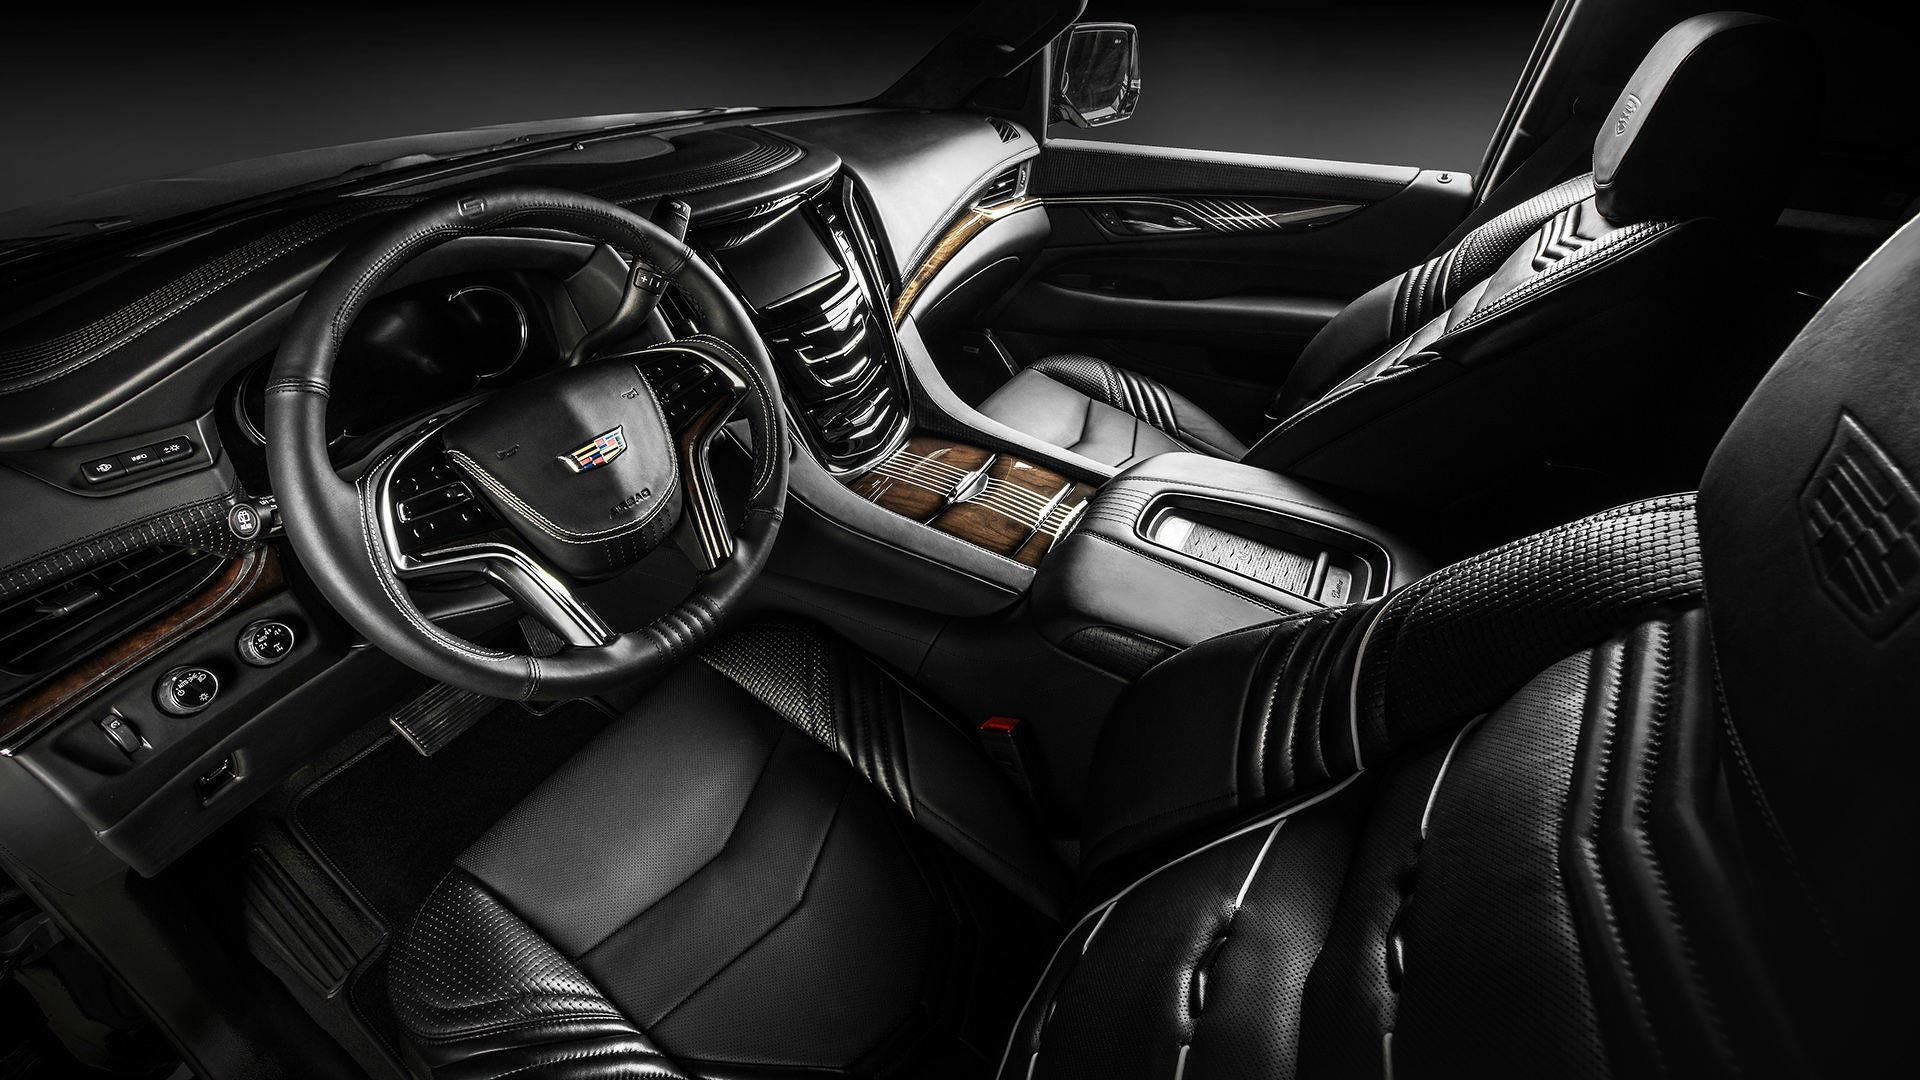 Cadillac escalade interior by carlex design takes luxury up a notch for Cadillac escalade custom interior